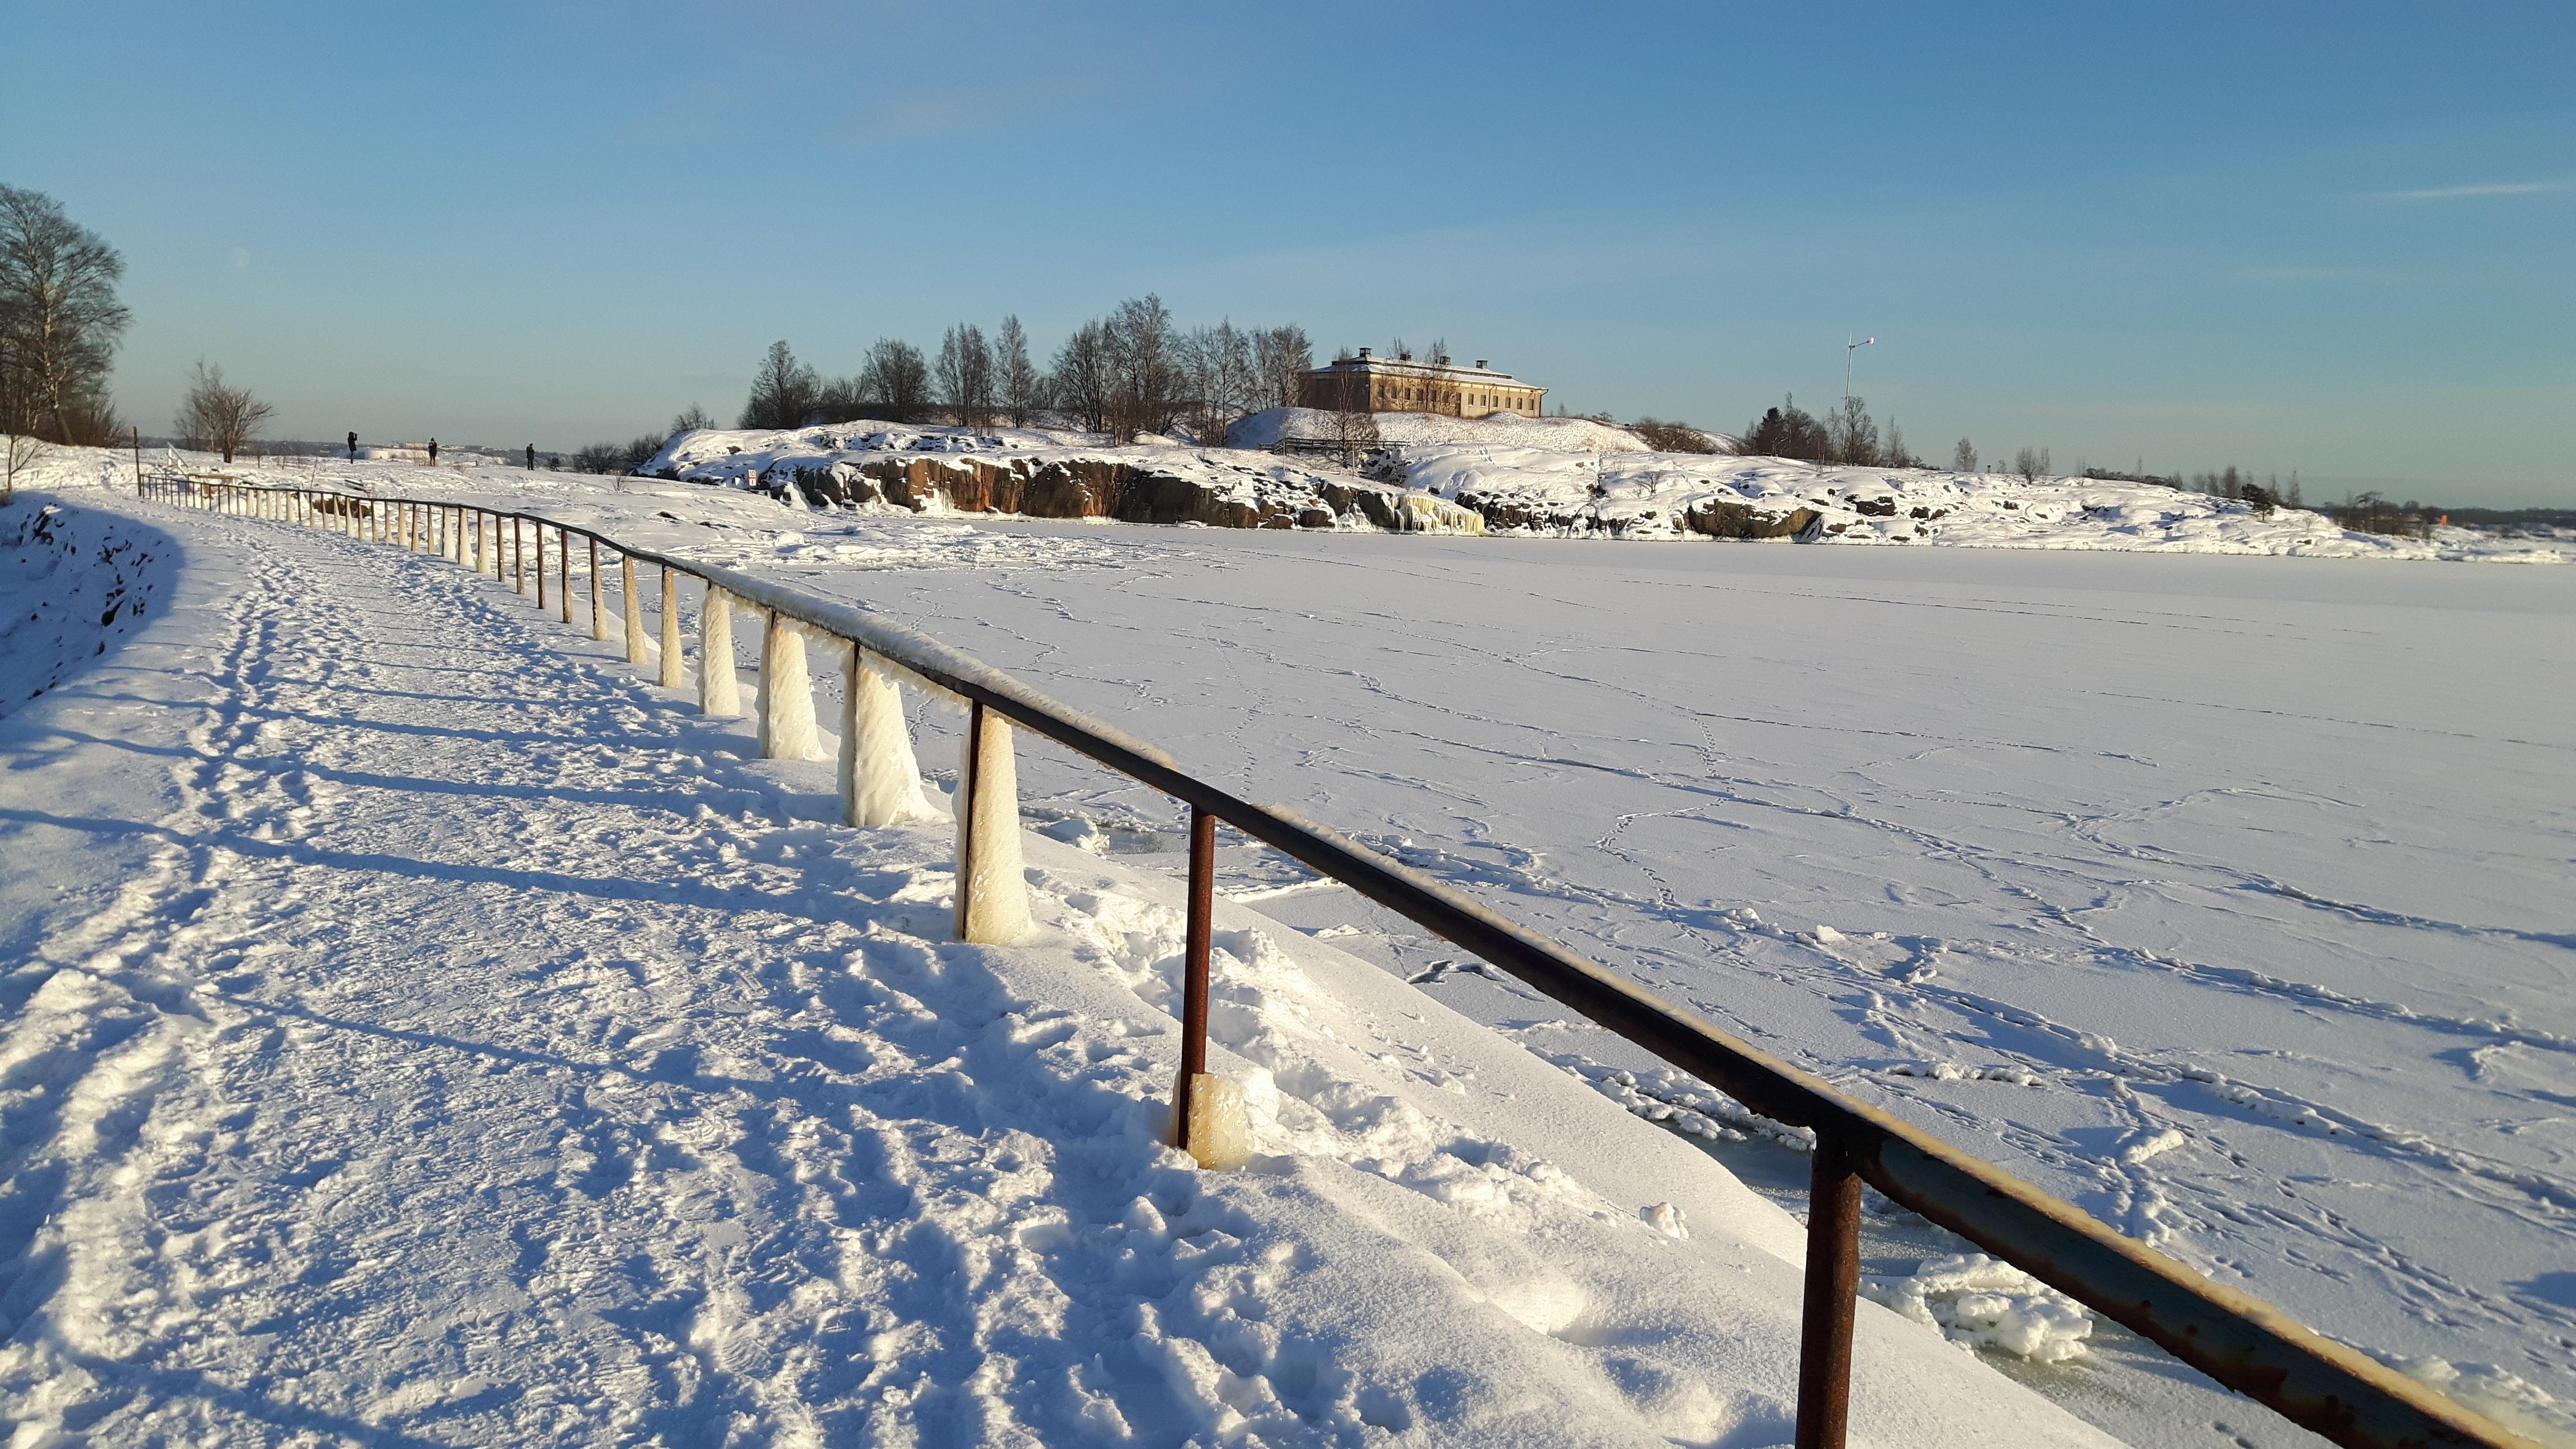 snow winter seasons sea - photo #16